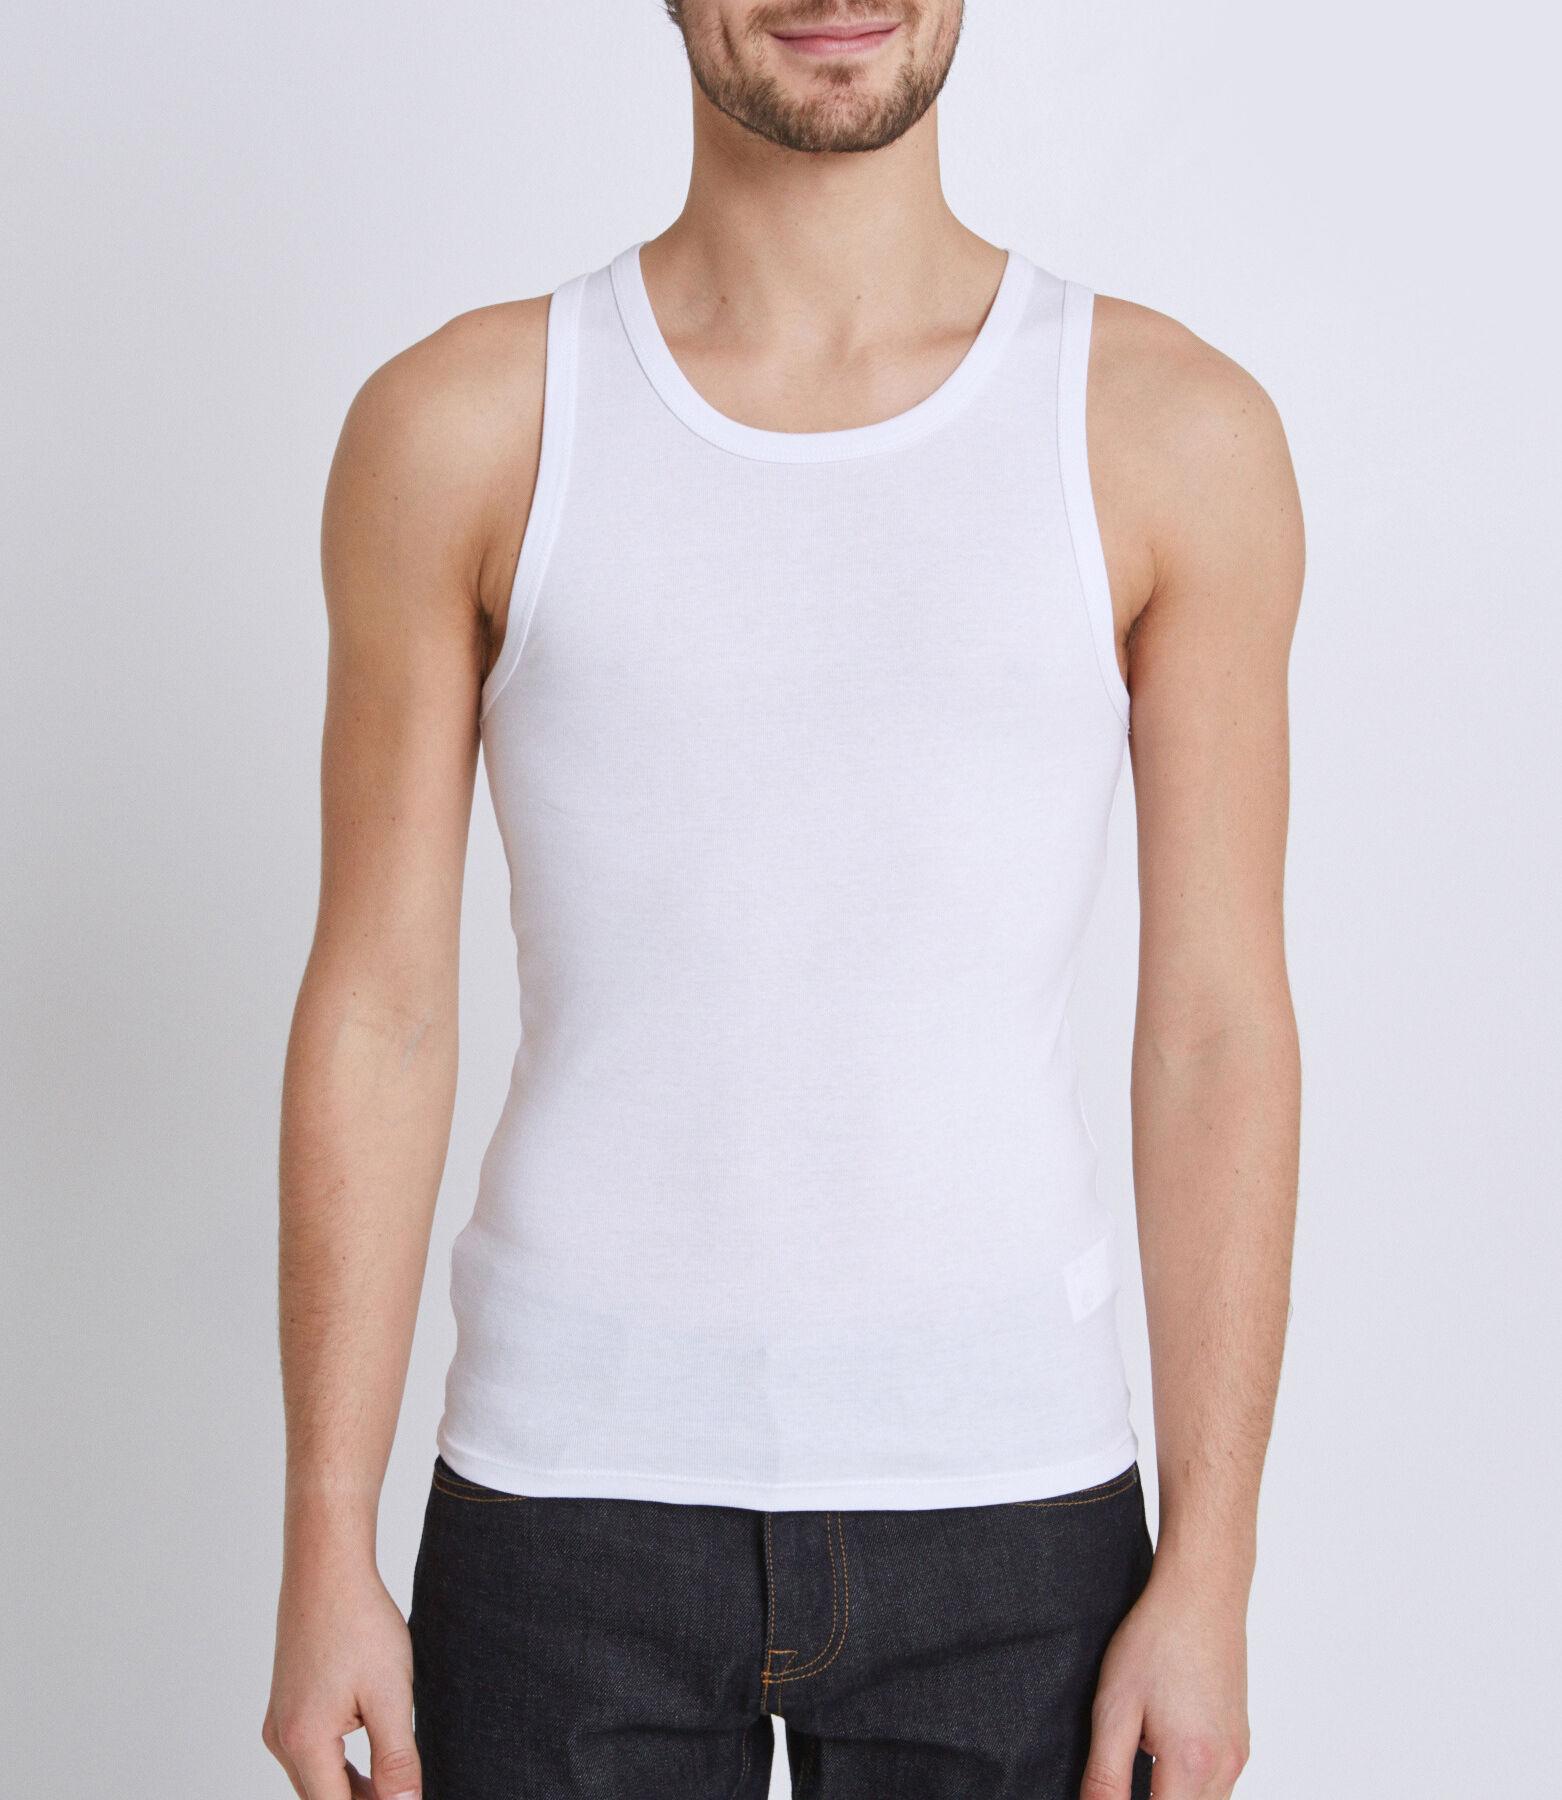 Mouwloos hemdje